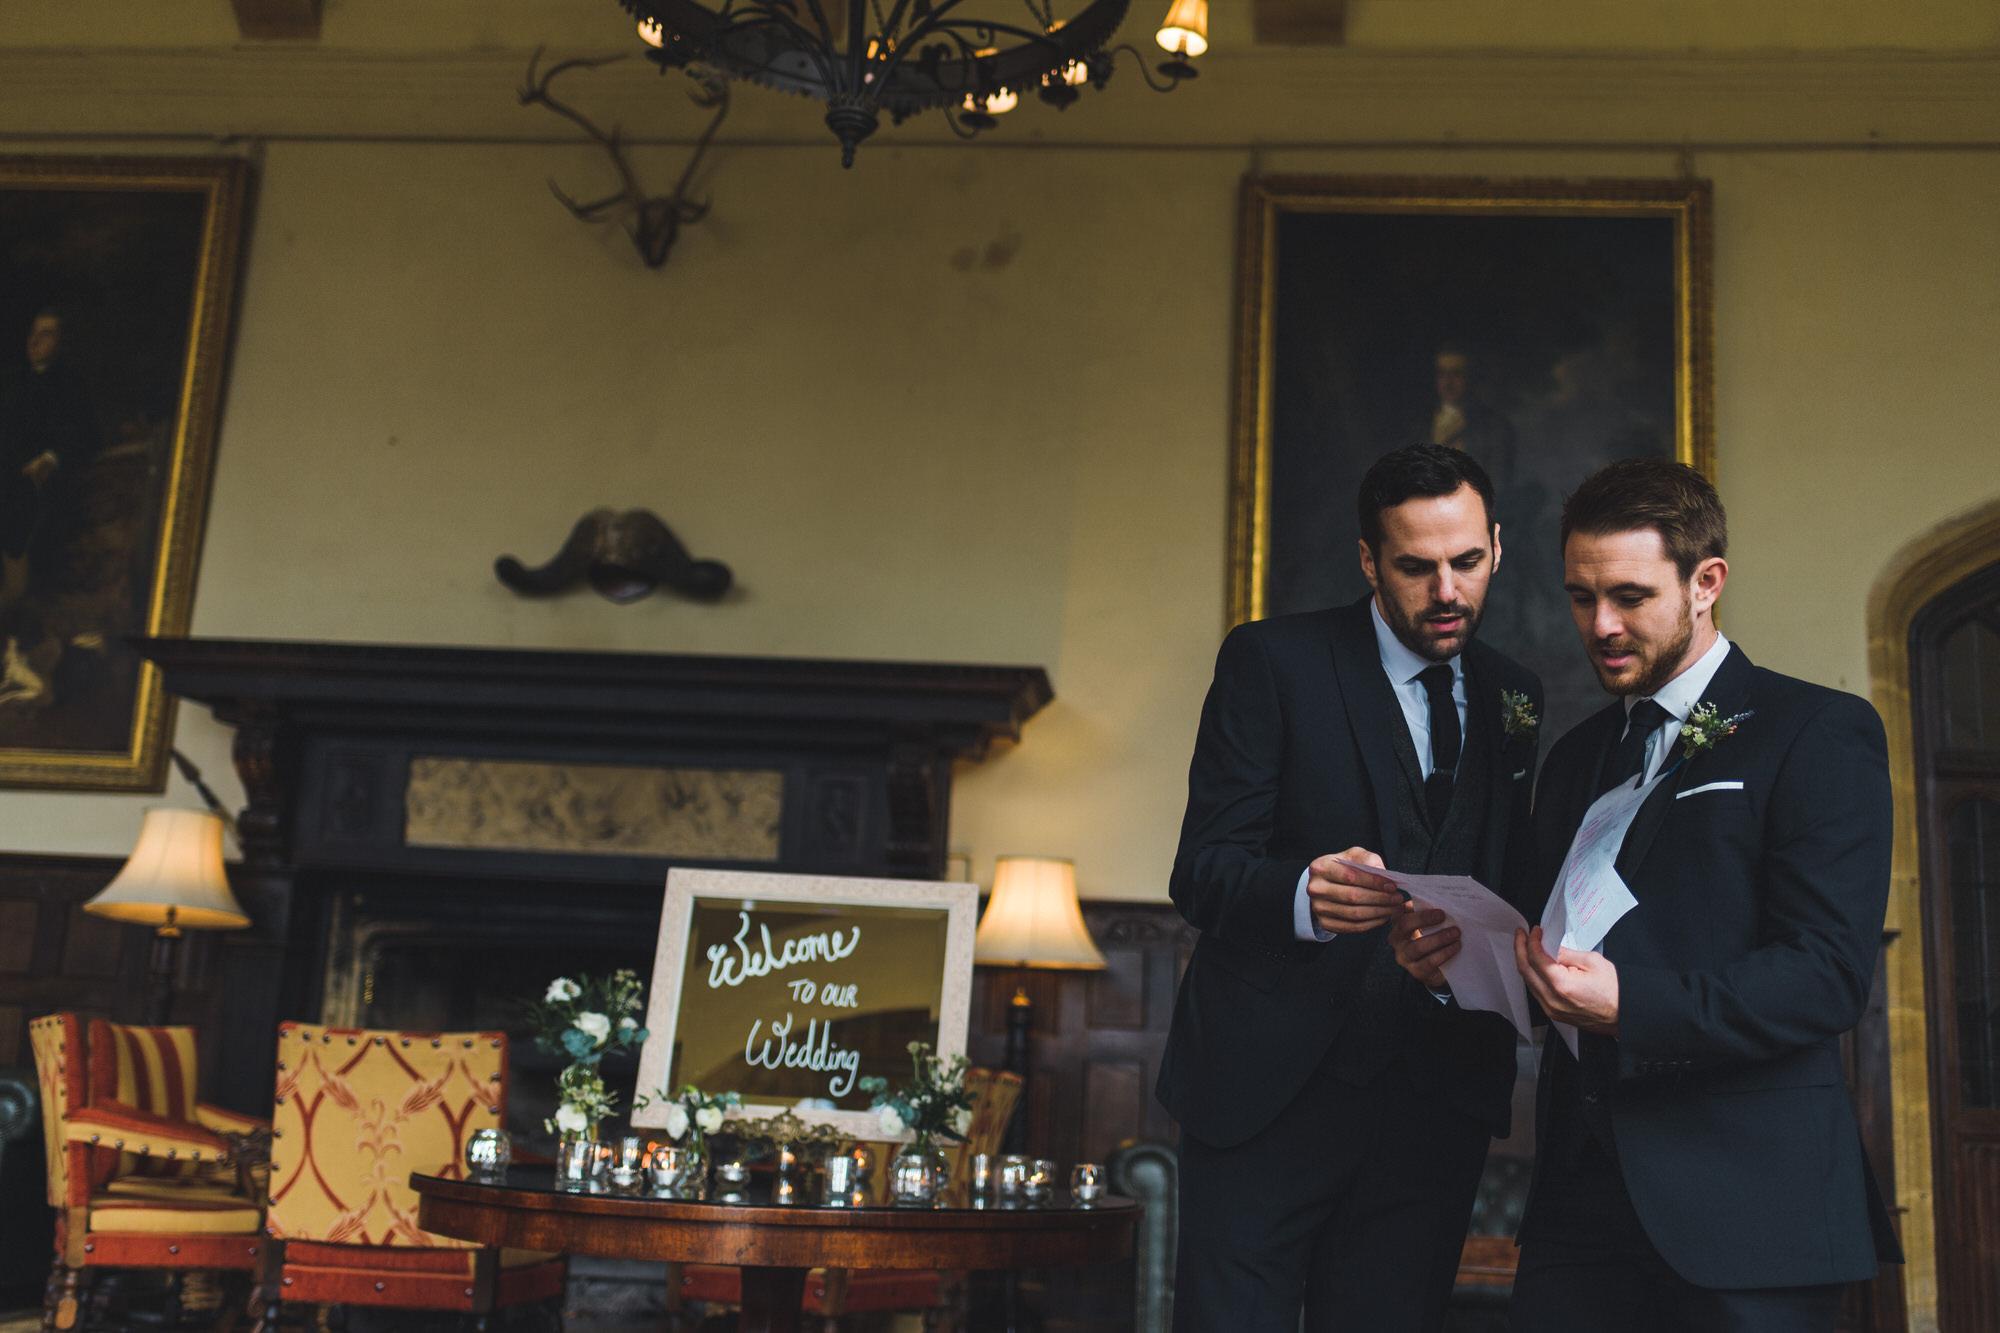 Brympton House wedding by simon biffen photography 3